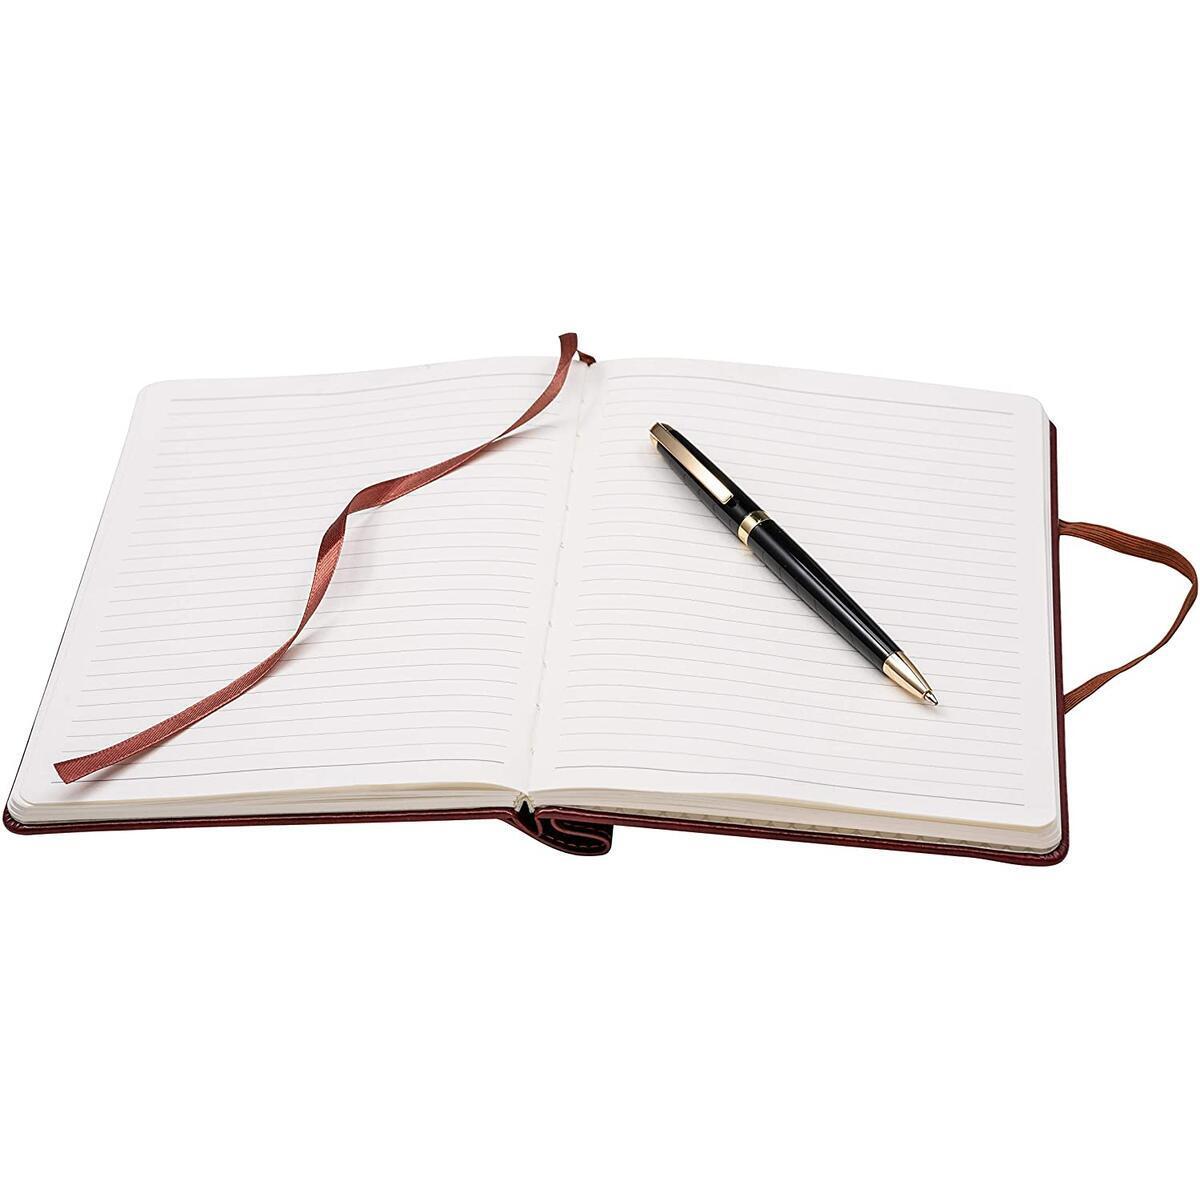 Settini Milano Pen. Luxury Pen.